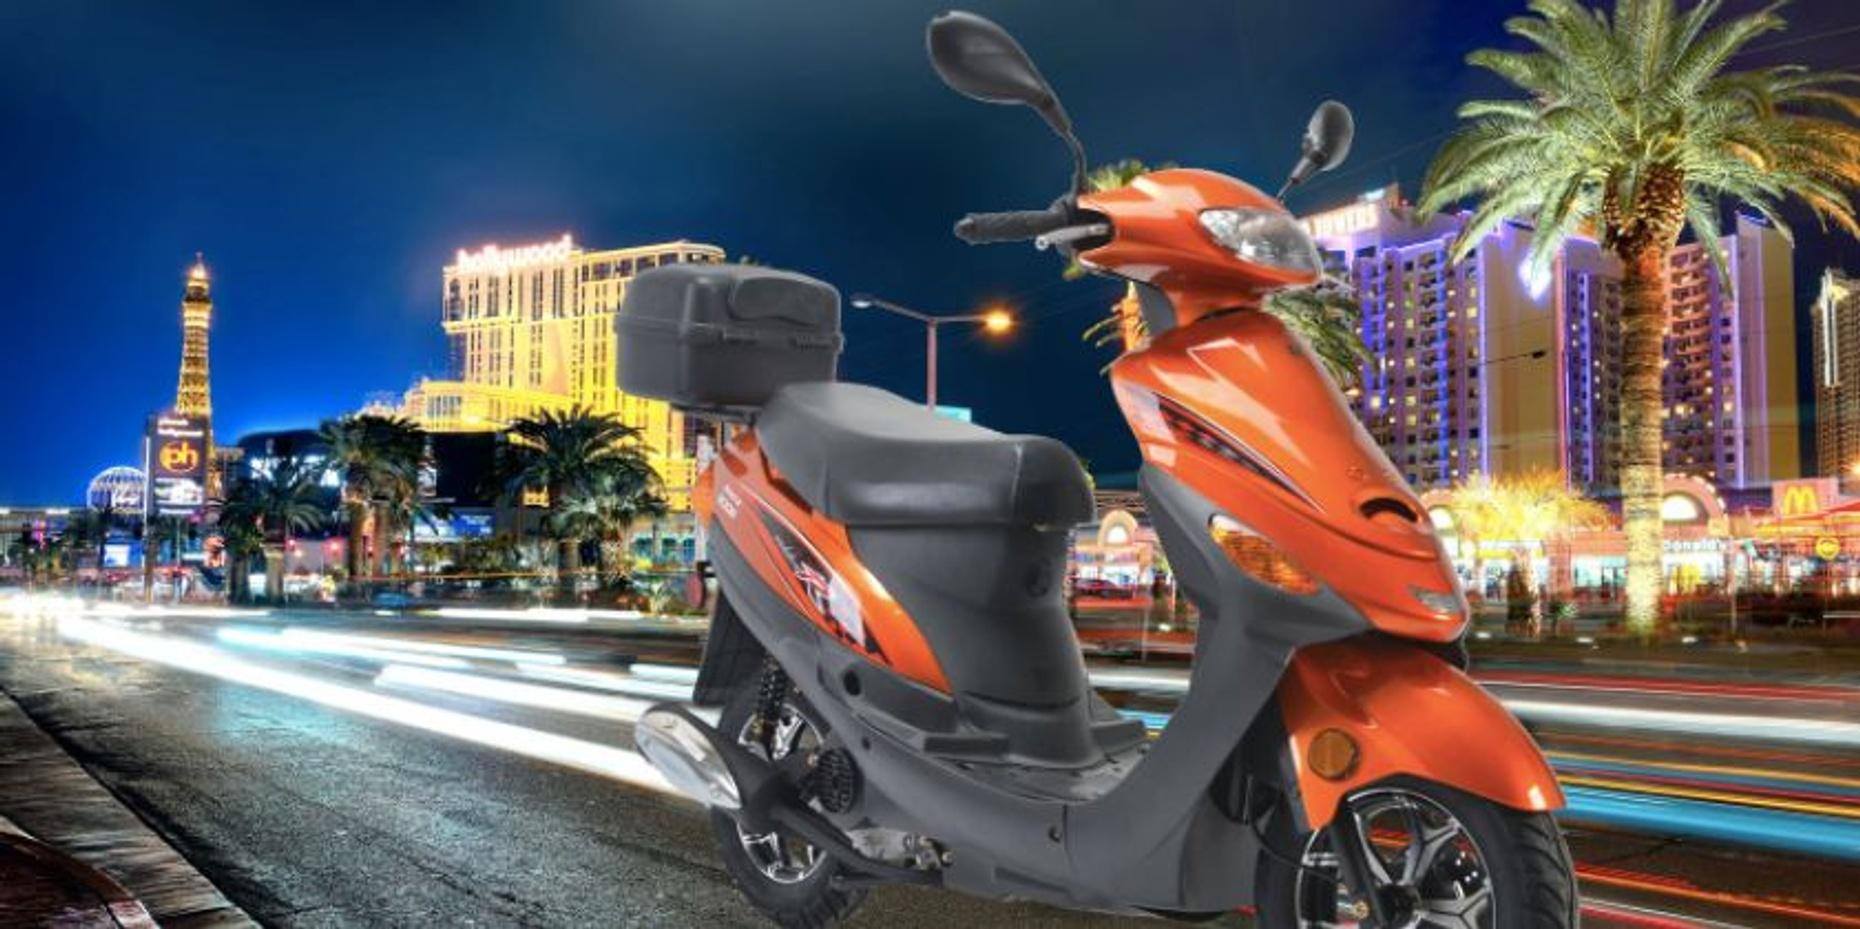 Full-Day Scooter Rental in Las Vegas